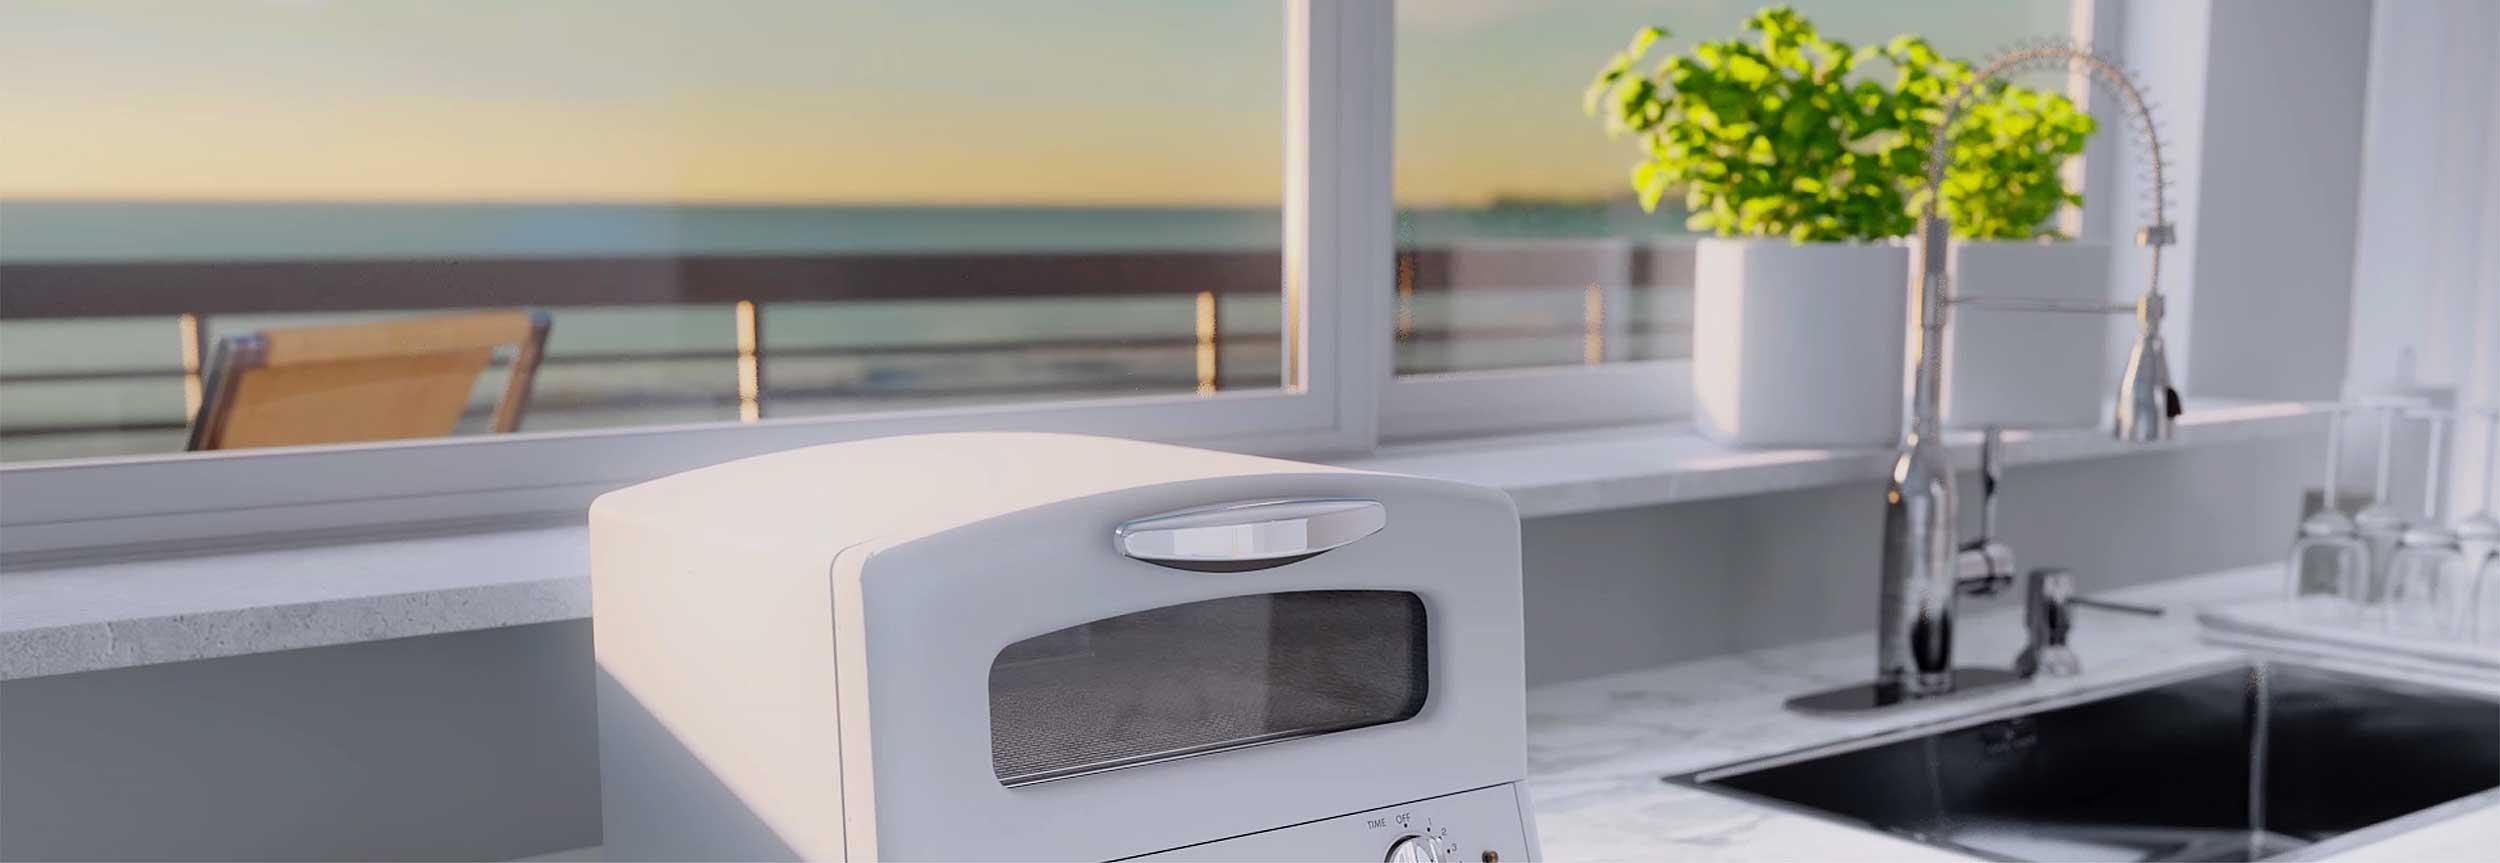 Toaster-Ovens-Slide-2